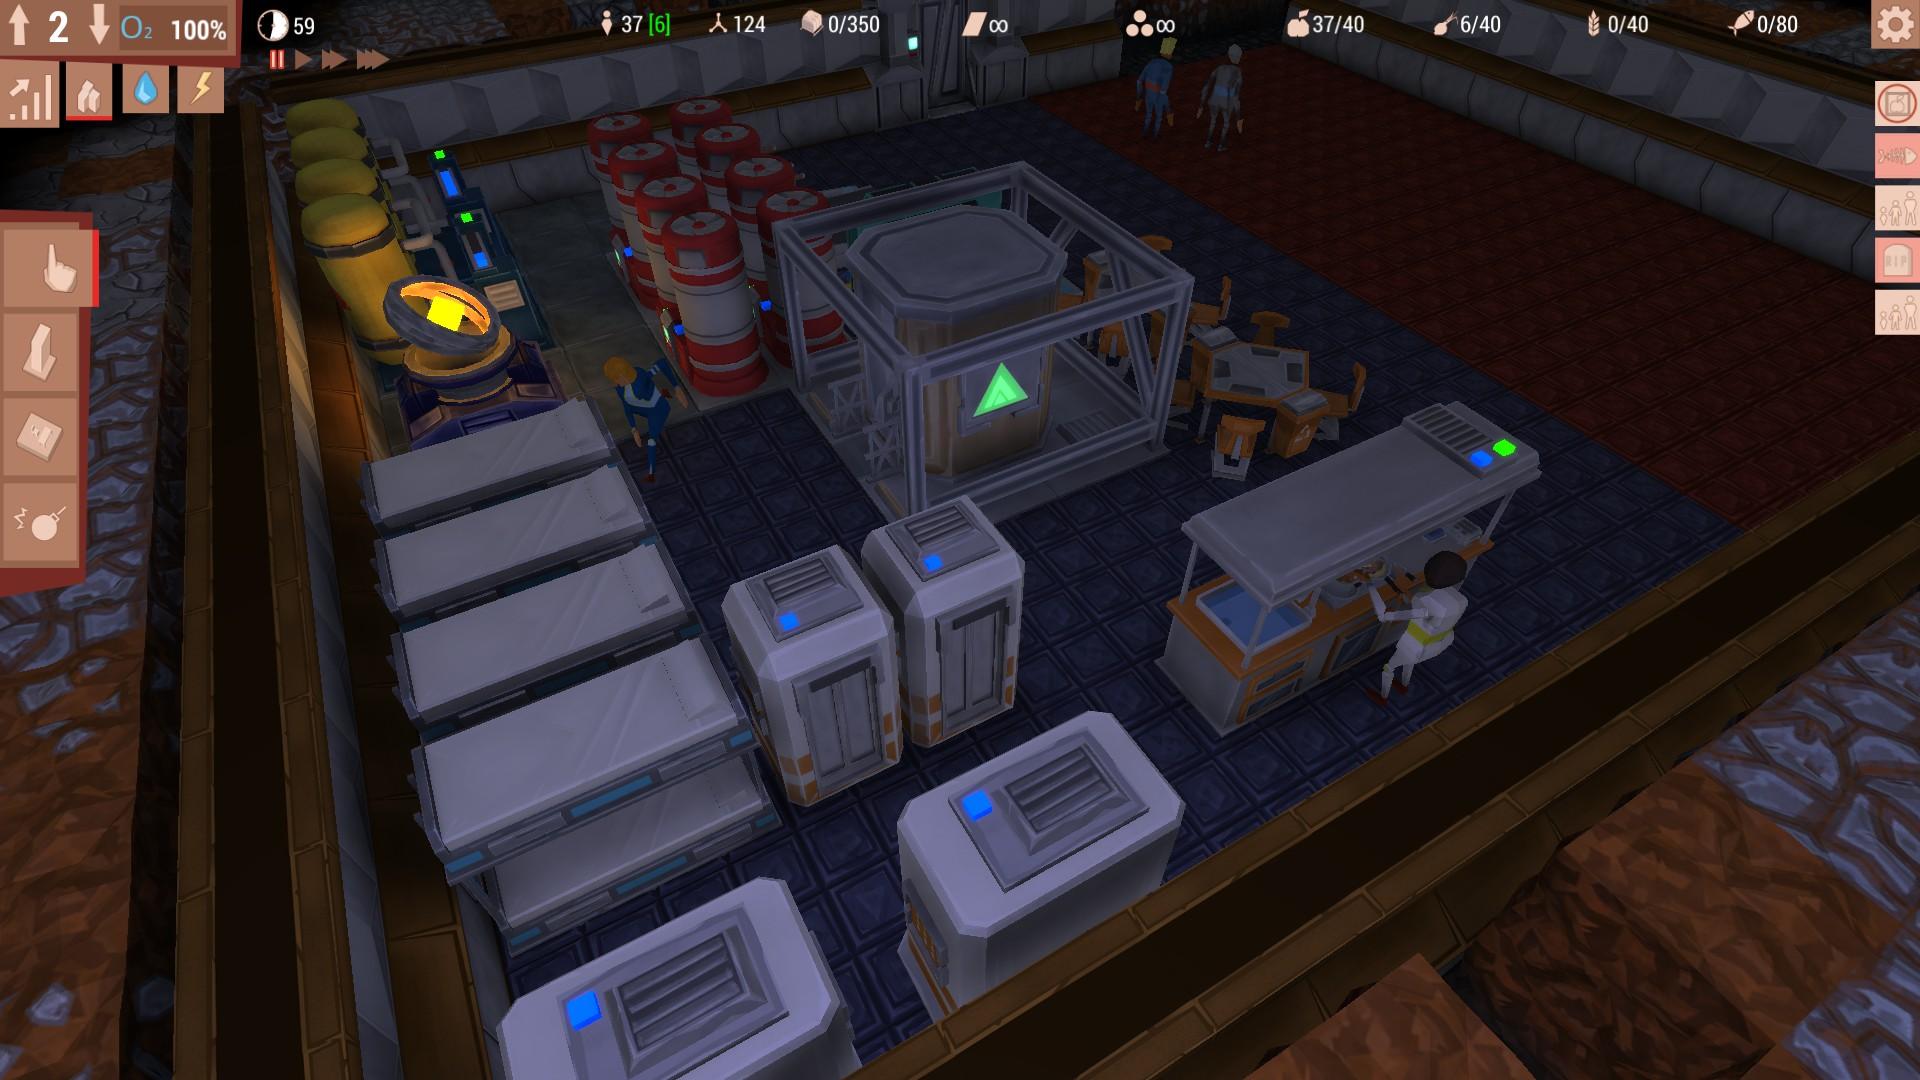 Life in Bunker image 2